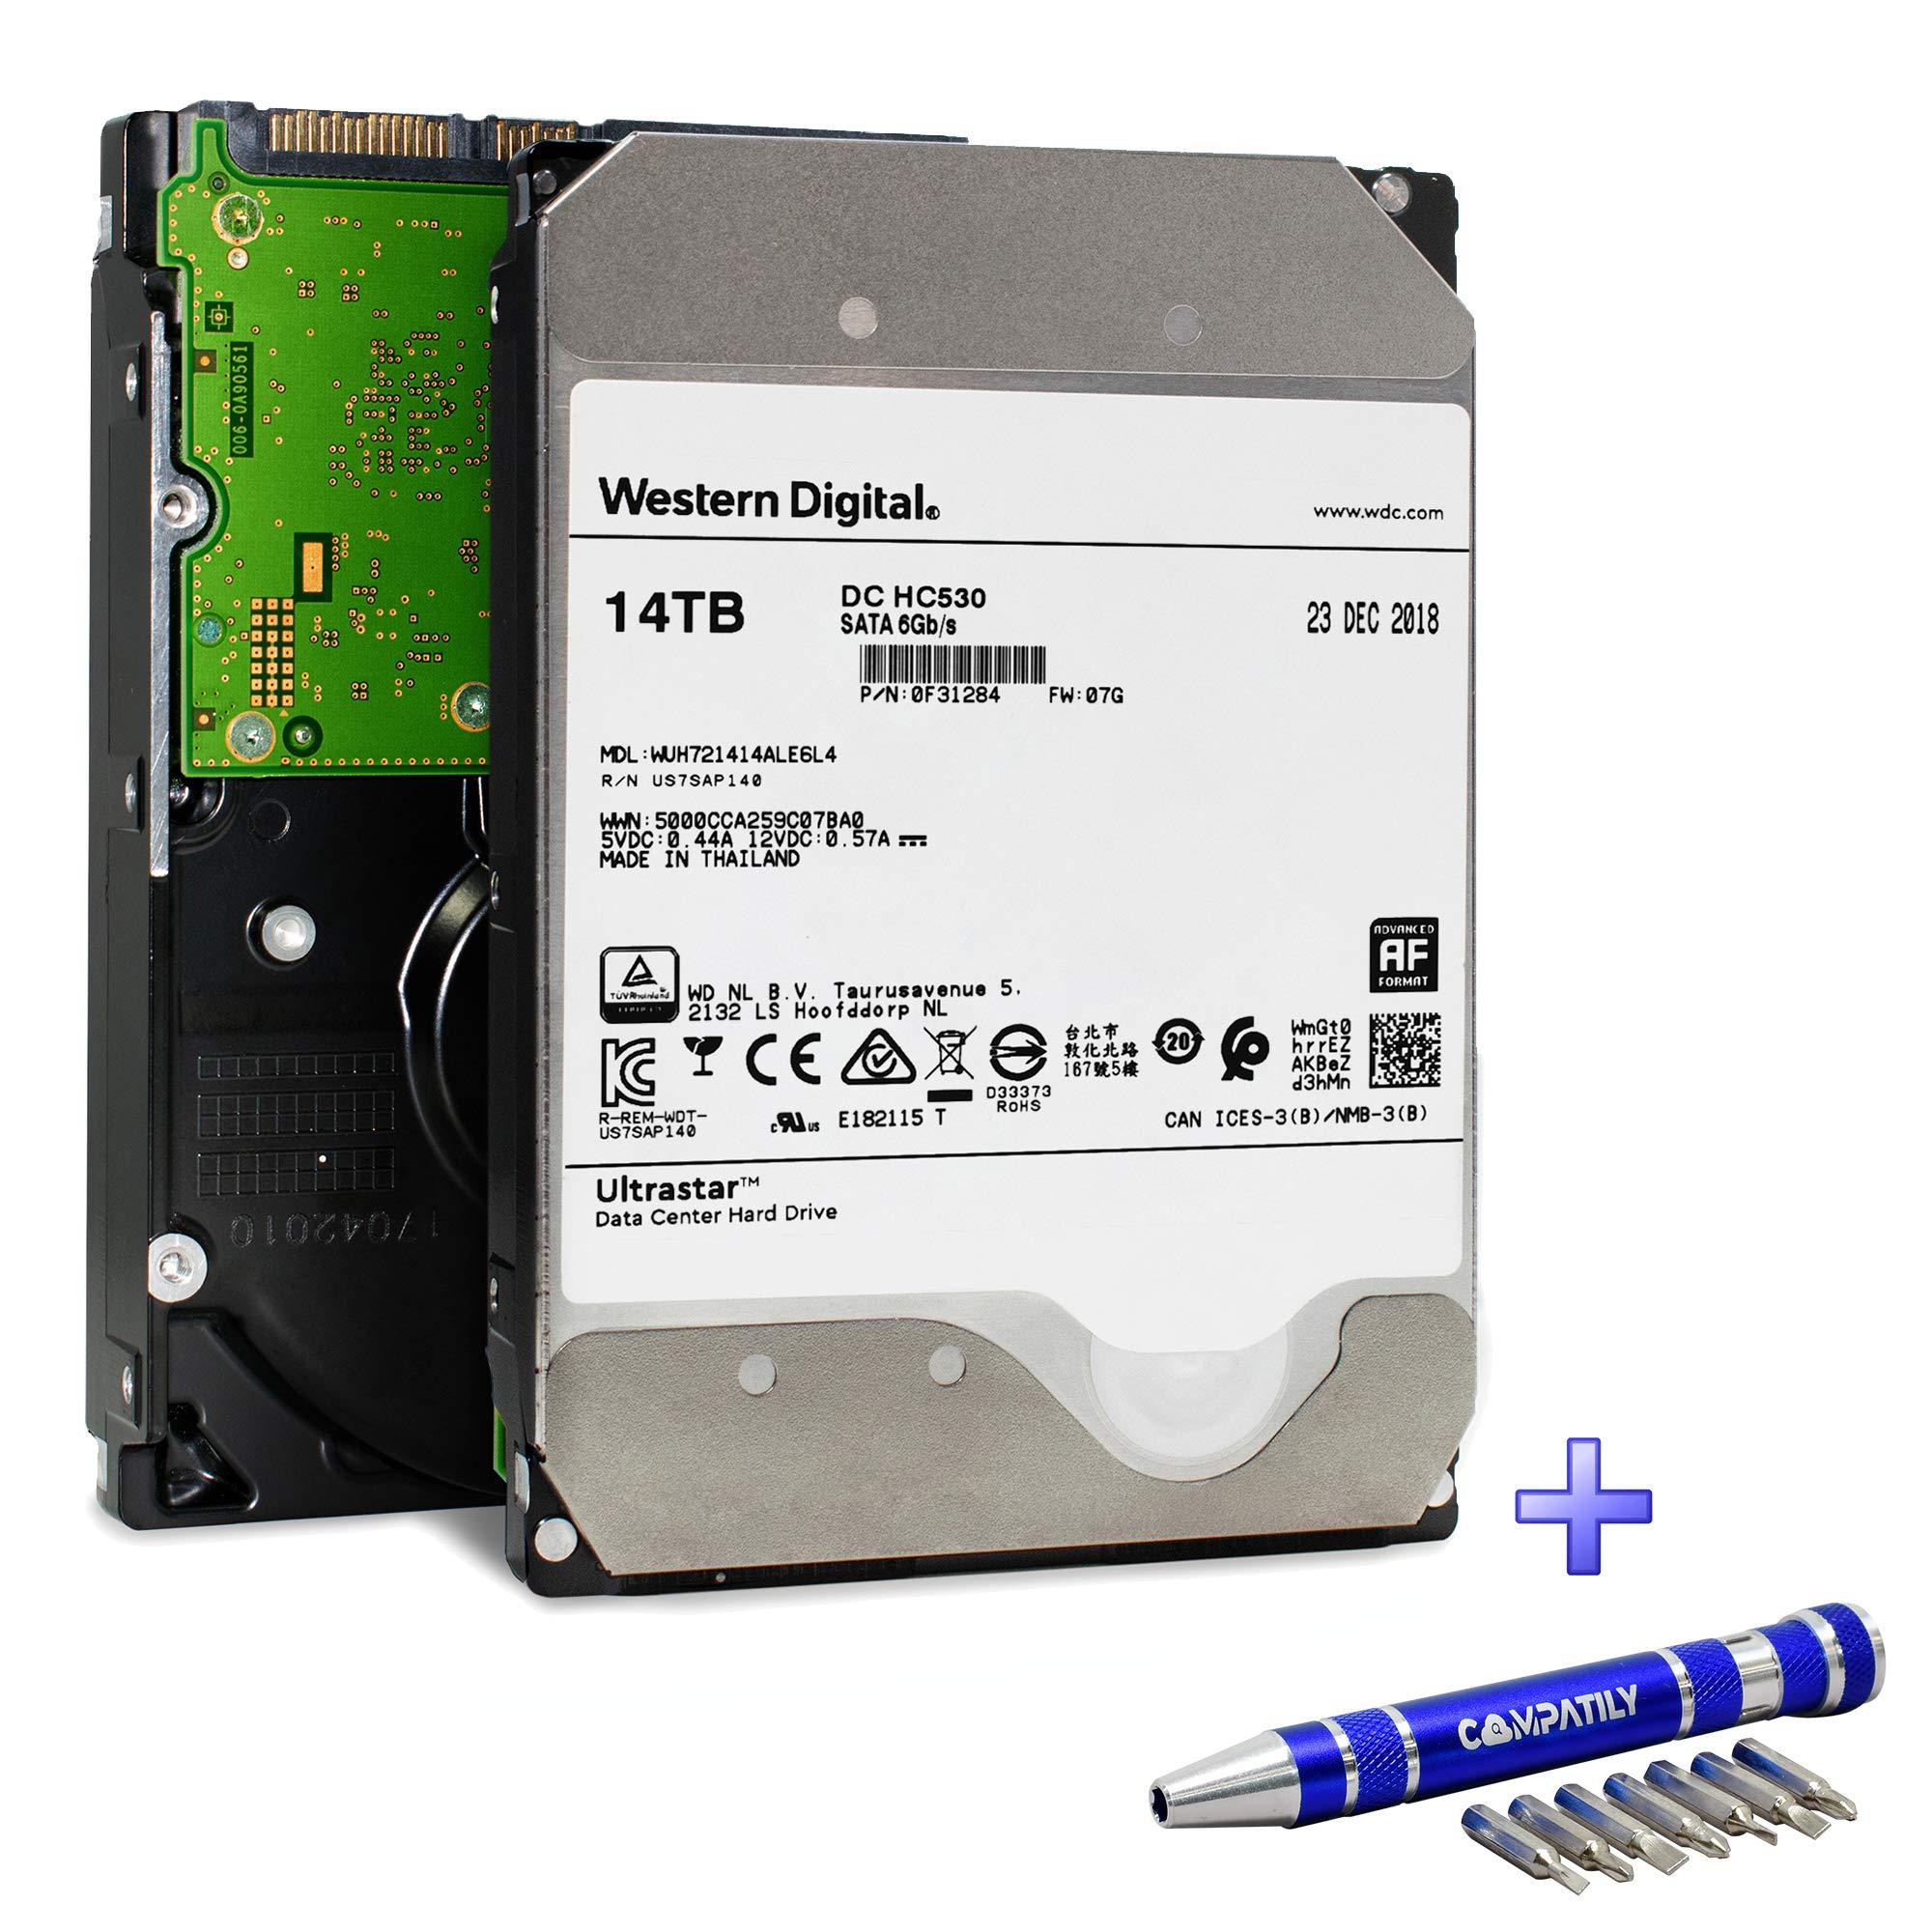 Western Digital Ultrastar DC HC530 HDD 14TB 7.2k RPM SATA 6Gb/s 512MB Cache 3.5-Inch Enterprise Data Center Hard Drive   WUH721414ALE6L4   Bundle with COMPATILY Aluminum Screw Driver Kit